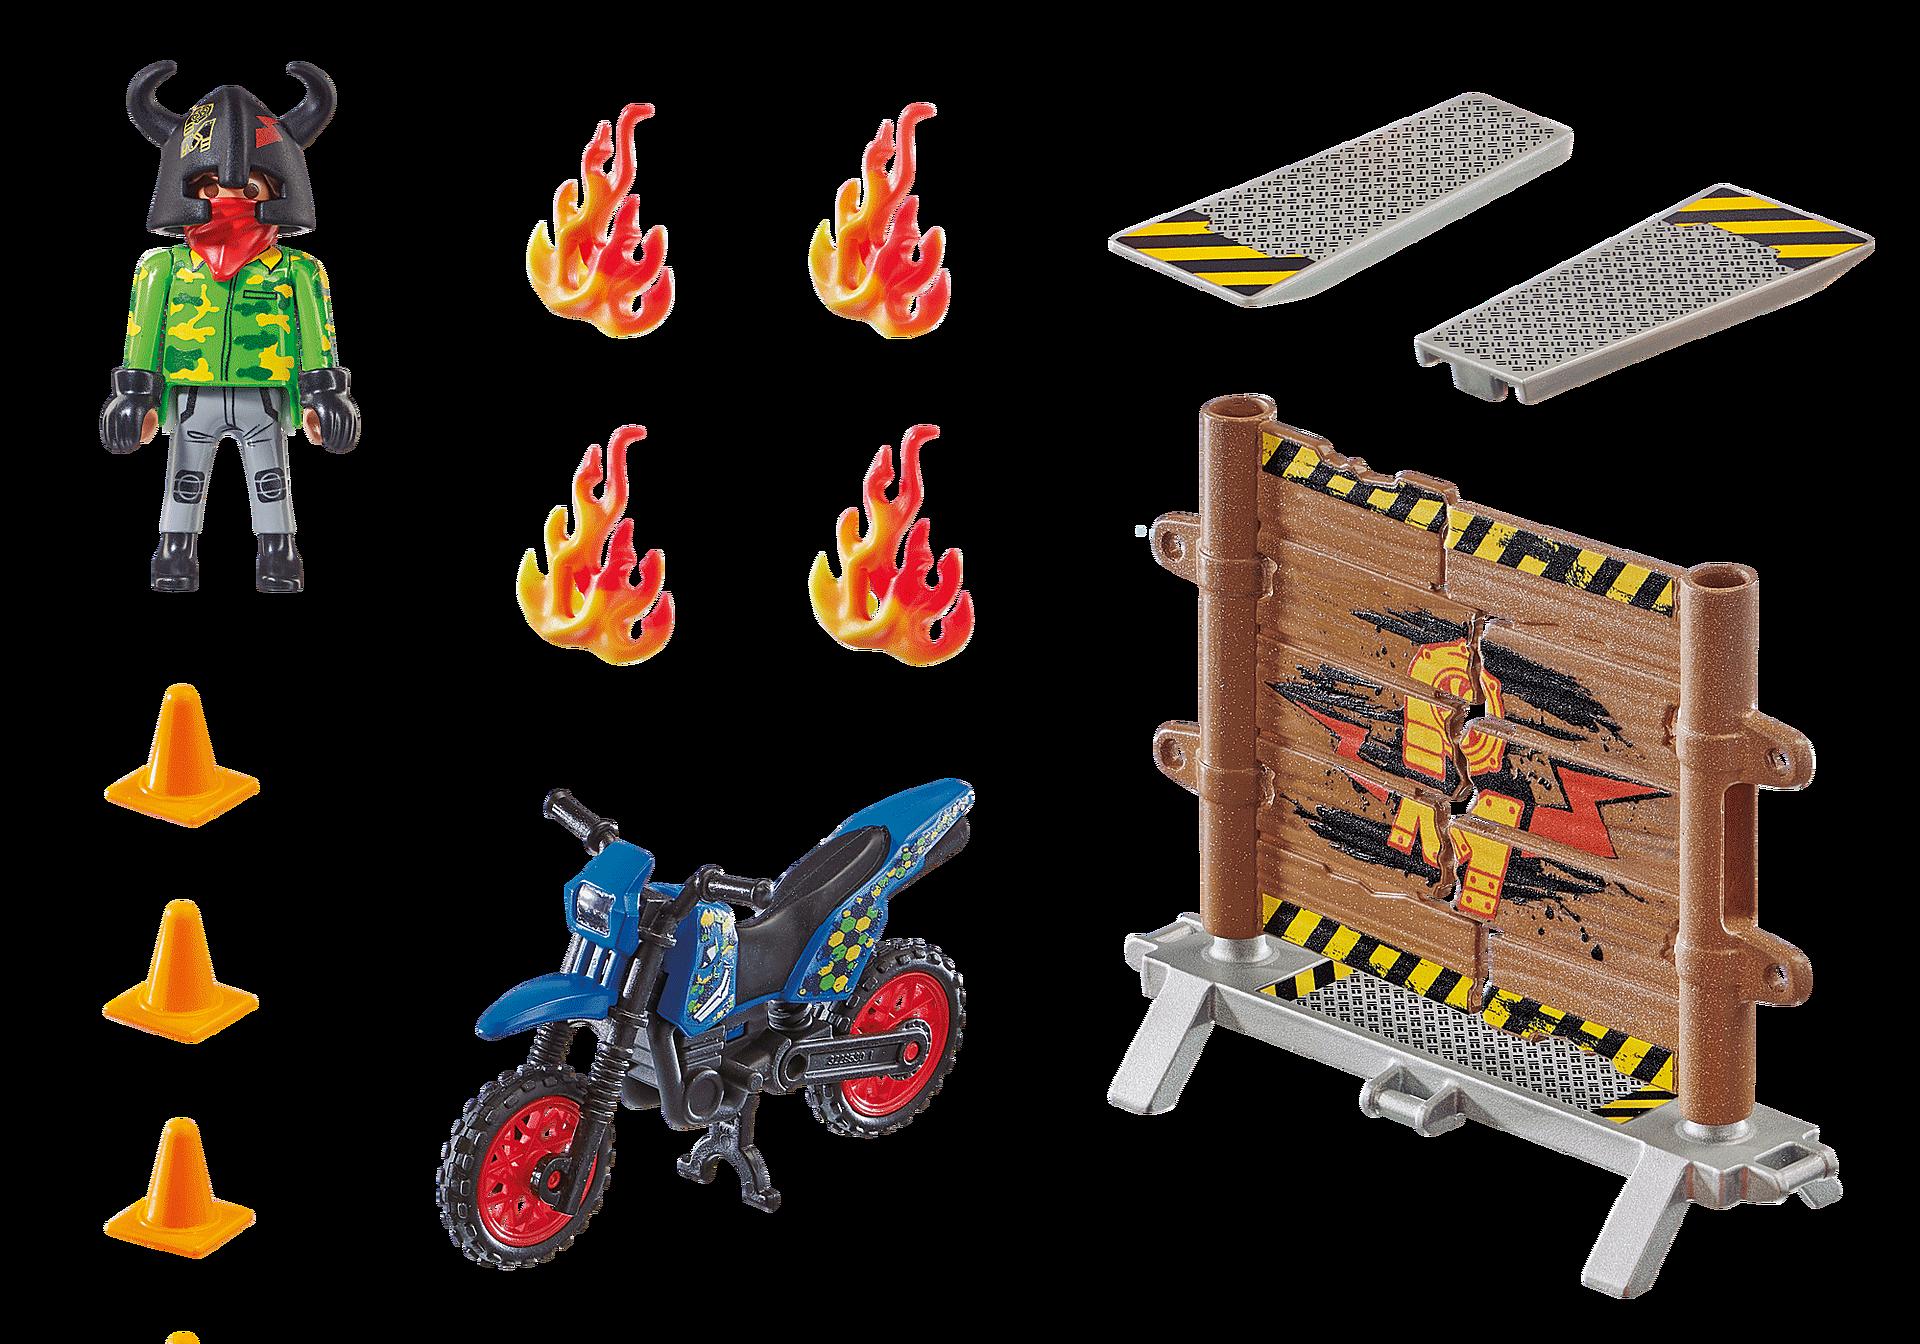 70553 Stuntshow Pilote de moto et mur de feu zoom image3